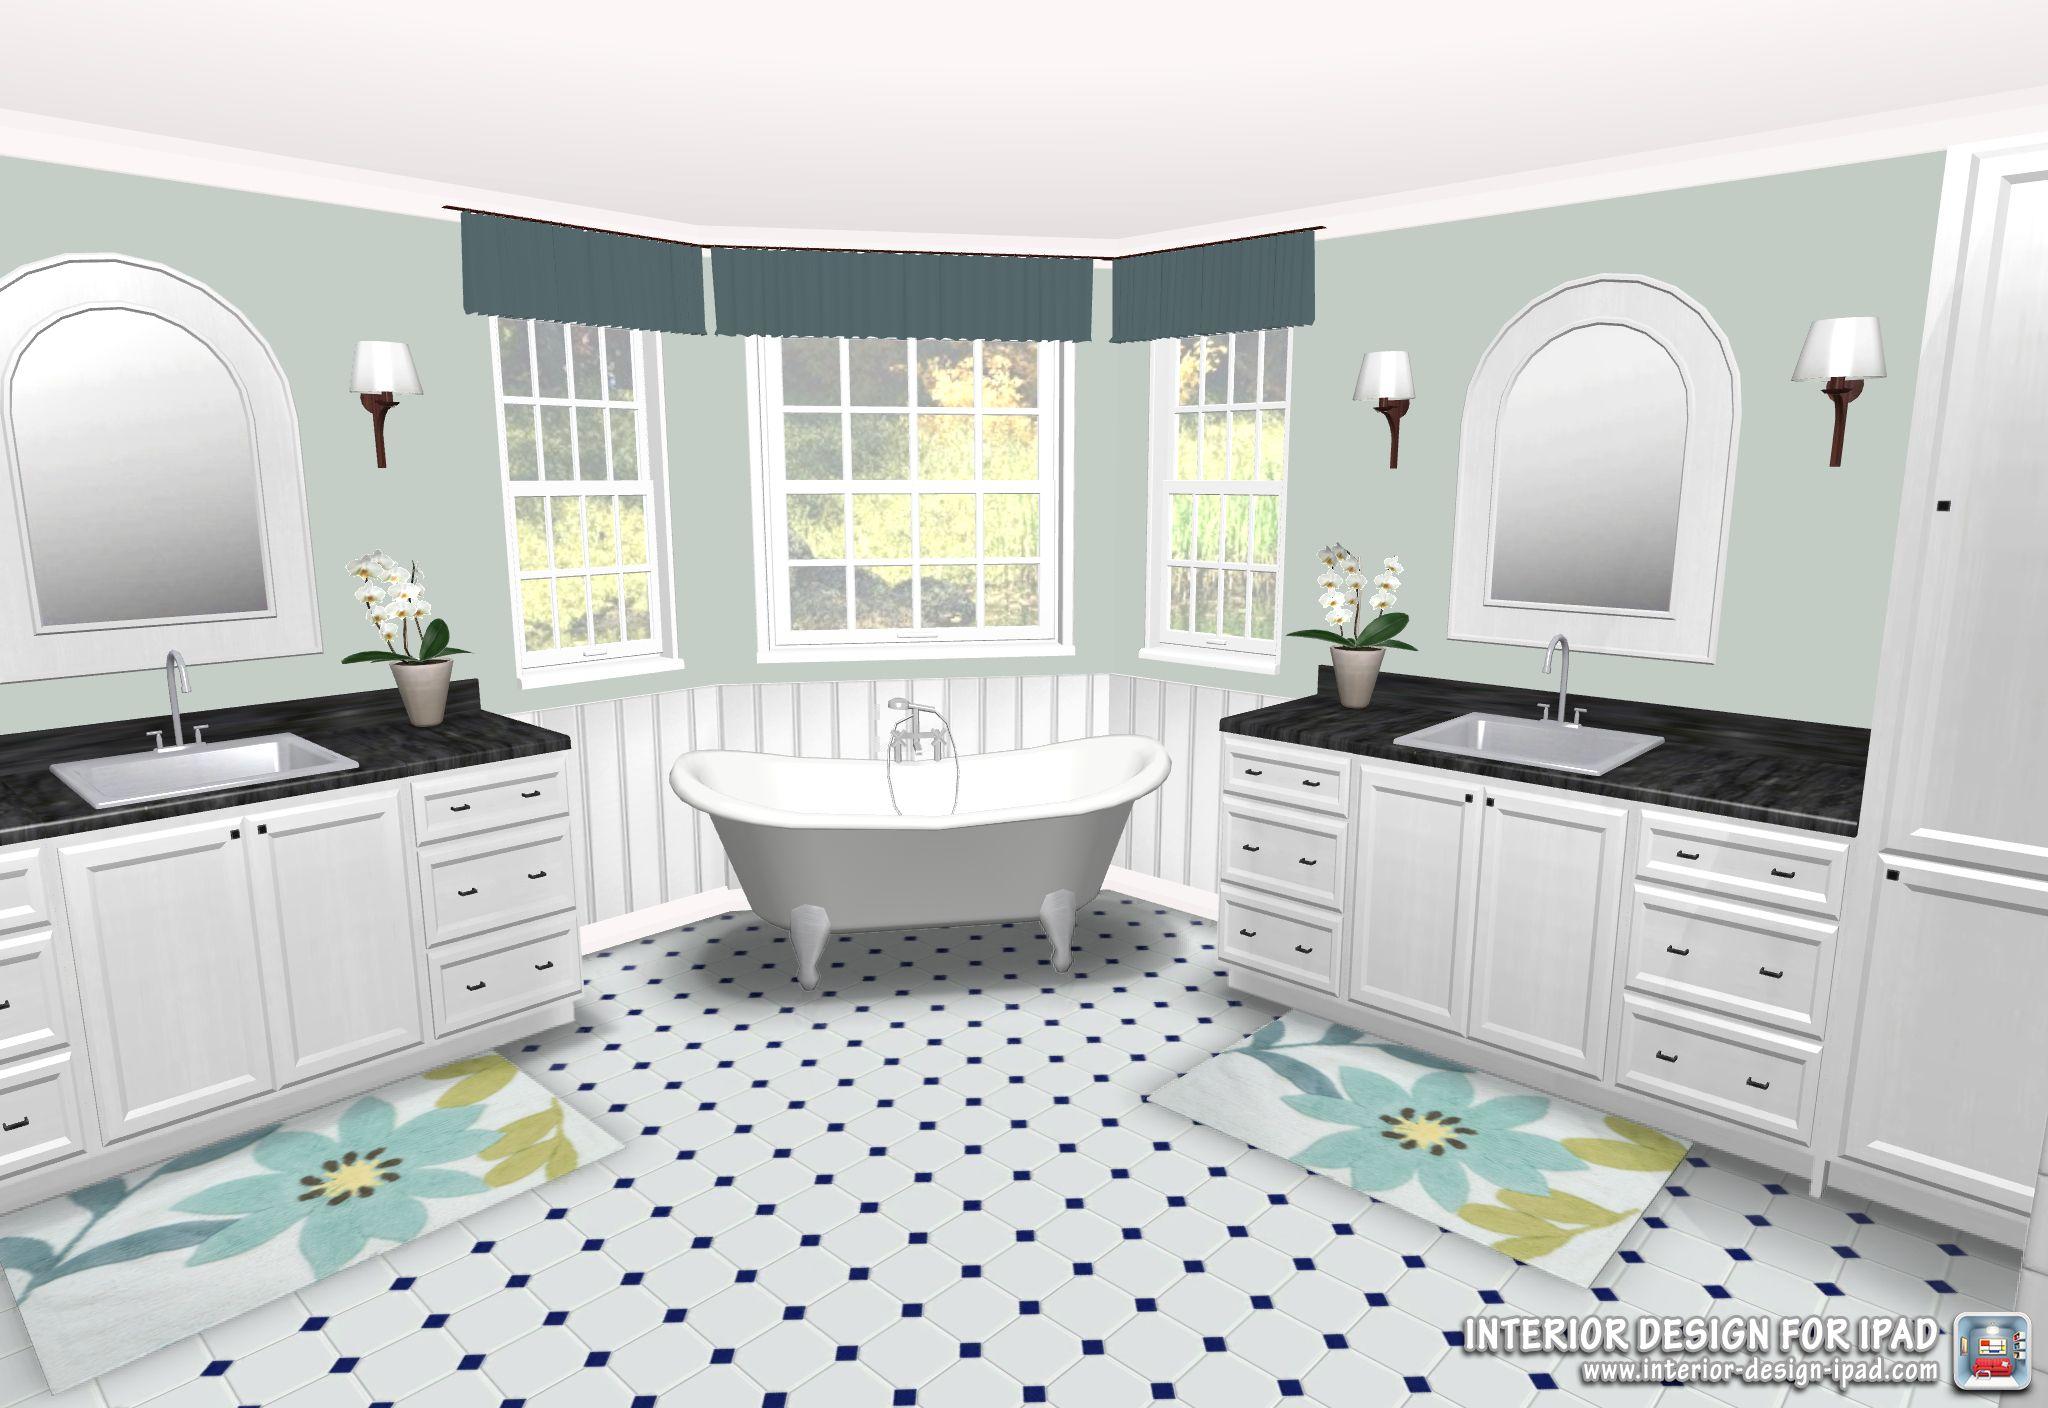 Luxury Bathroom Created With Interior Design For Ipad App